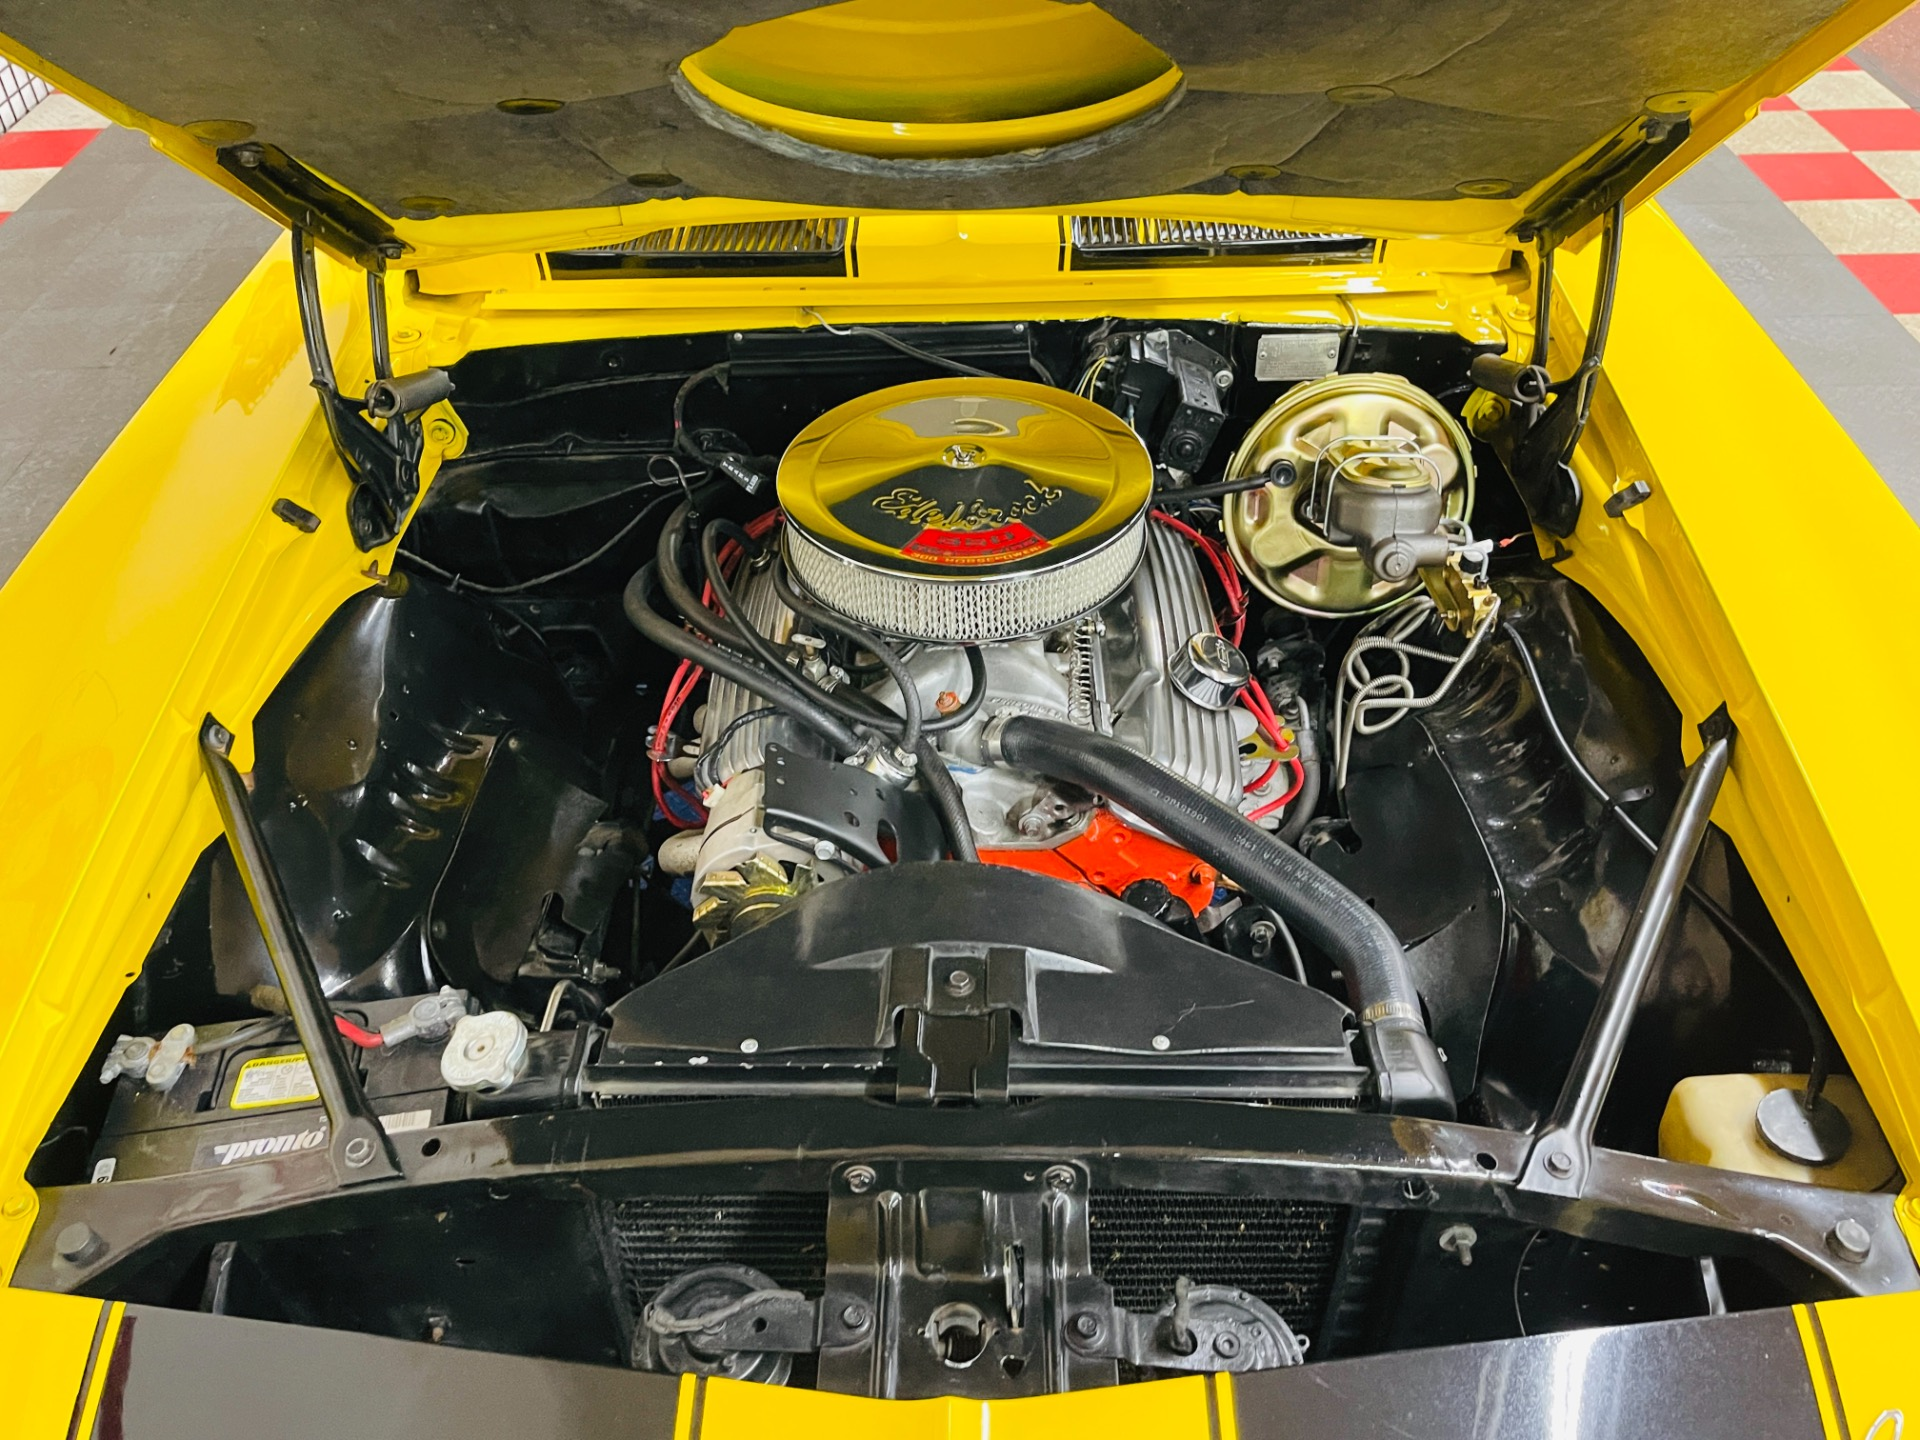 Used 1969 Chevrolet Camaro - DAYTONA YELLOW - X11 TRIM GROUP - VERY CLEAN - SEE VIDEO | Mundelein, IL